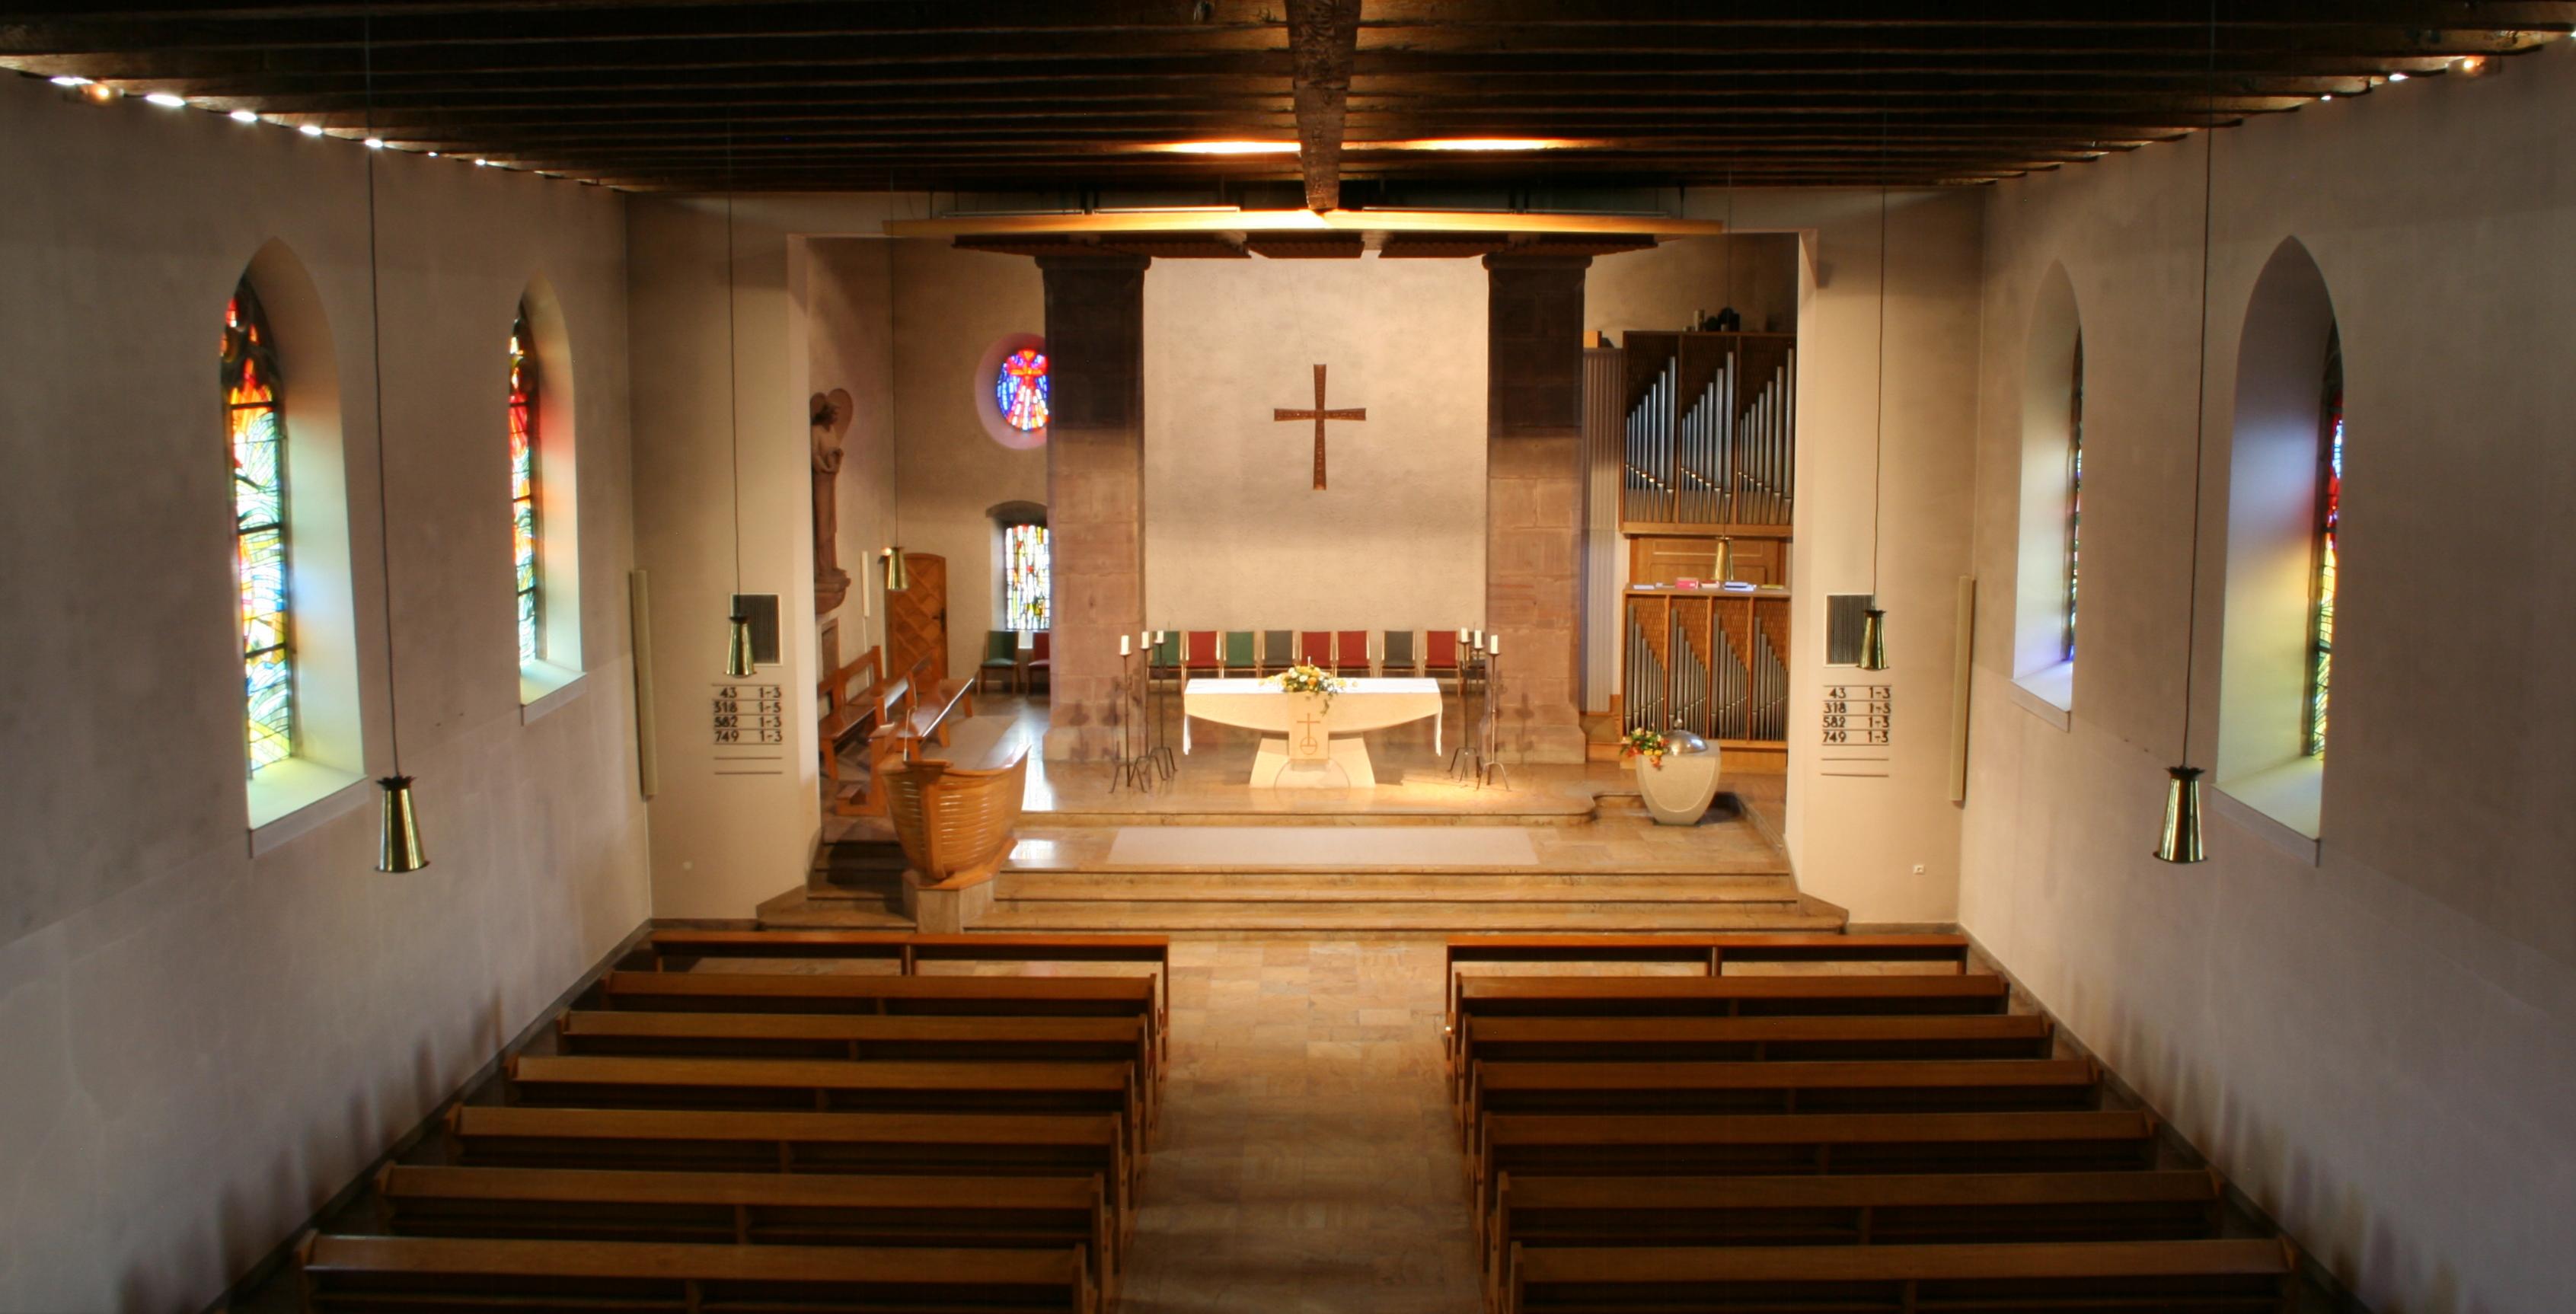 inside protestant church diagram kc hilites wiring file eglise protestante d 39illkirch interior 1 jpg